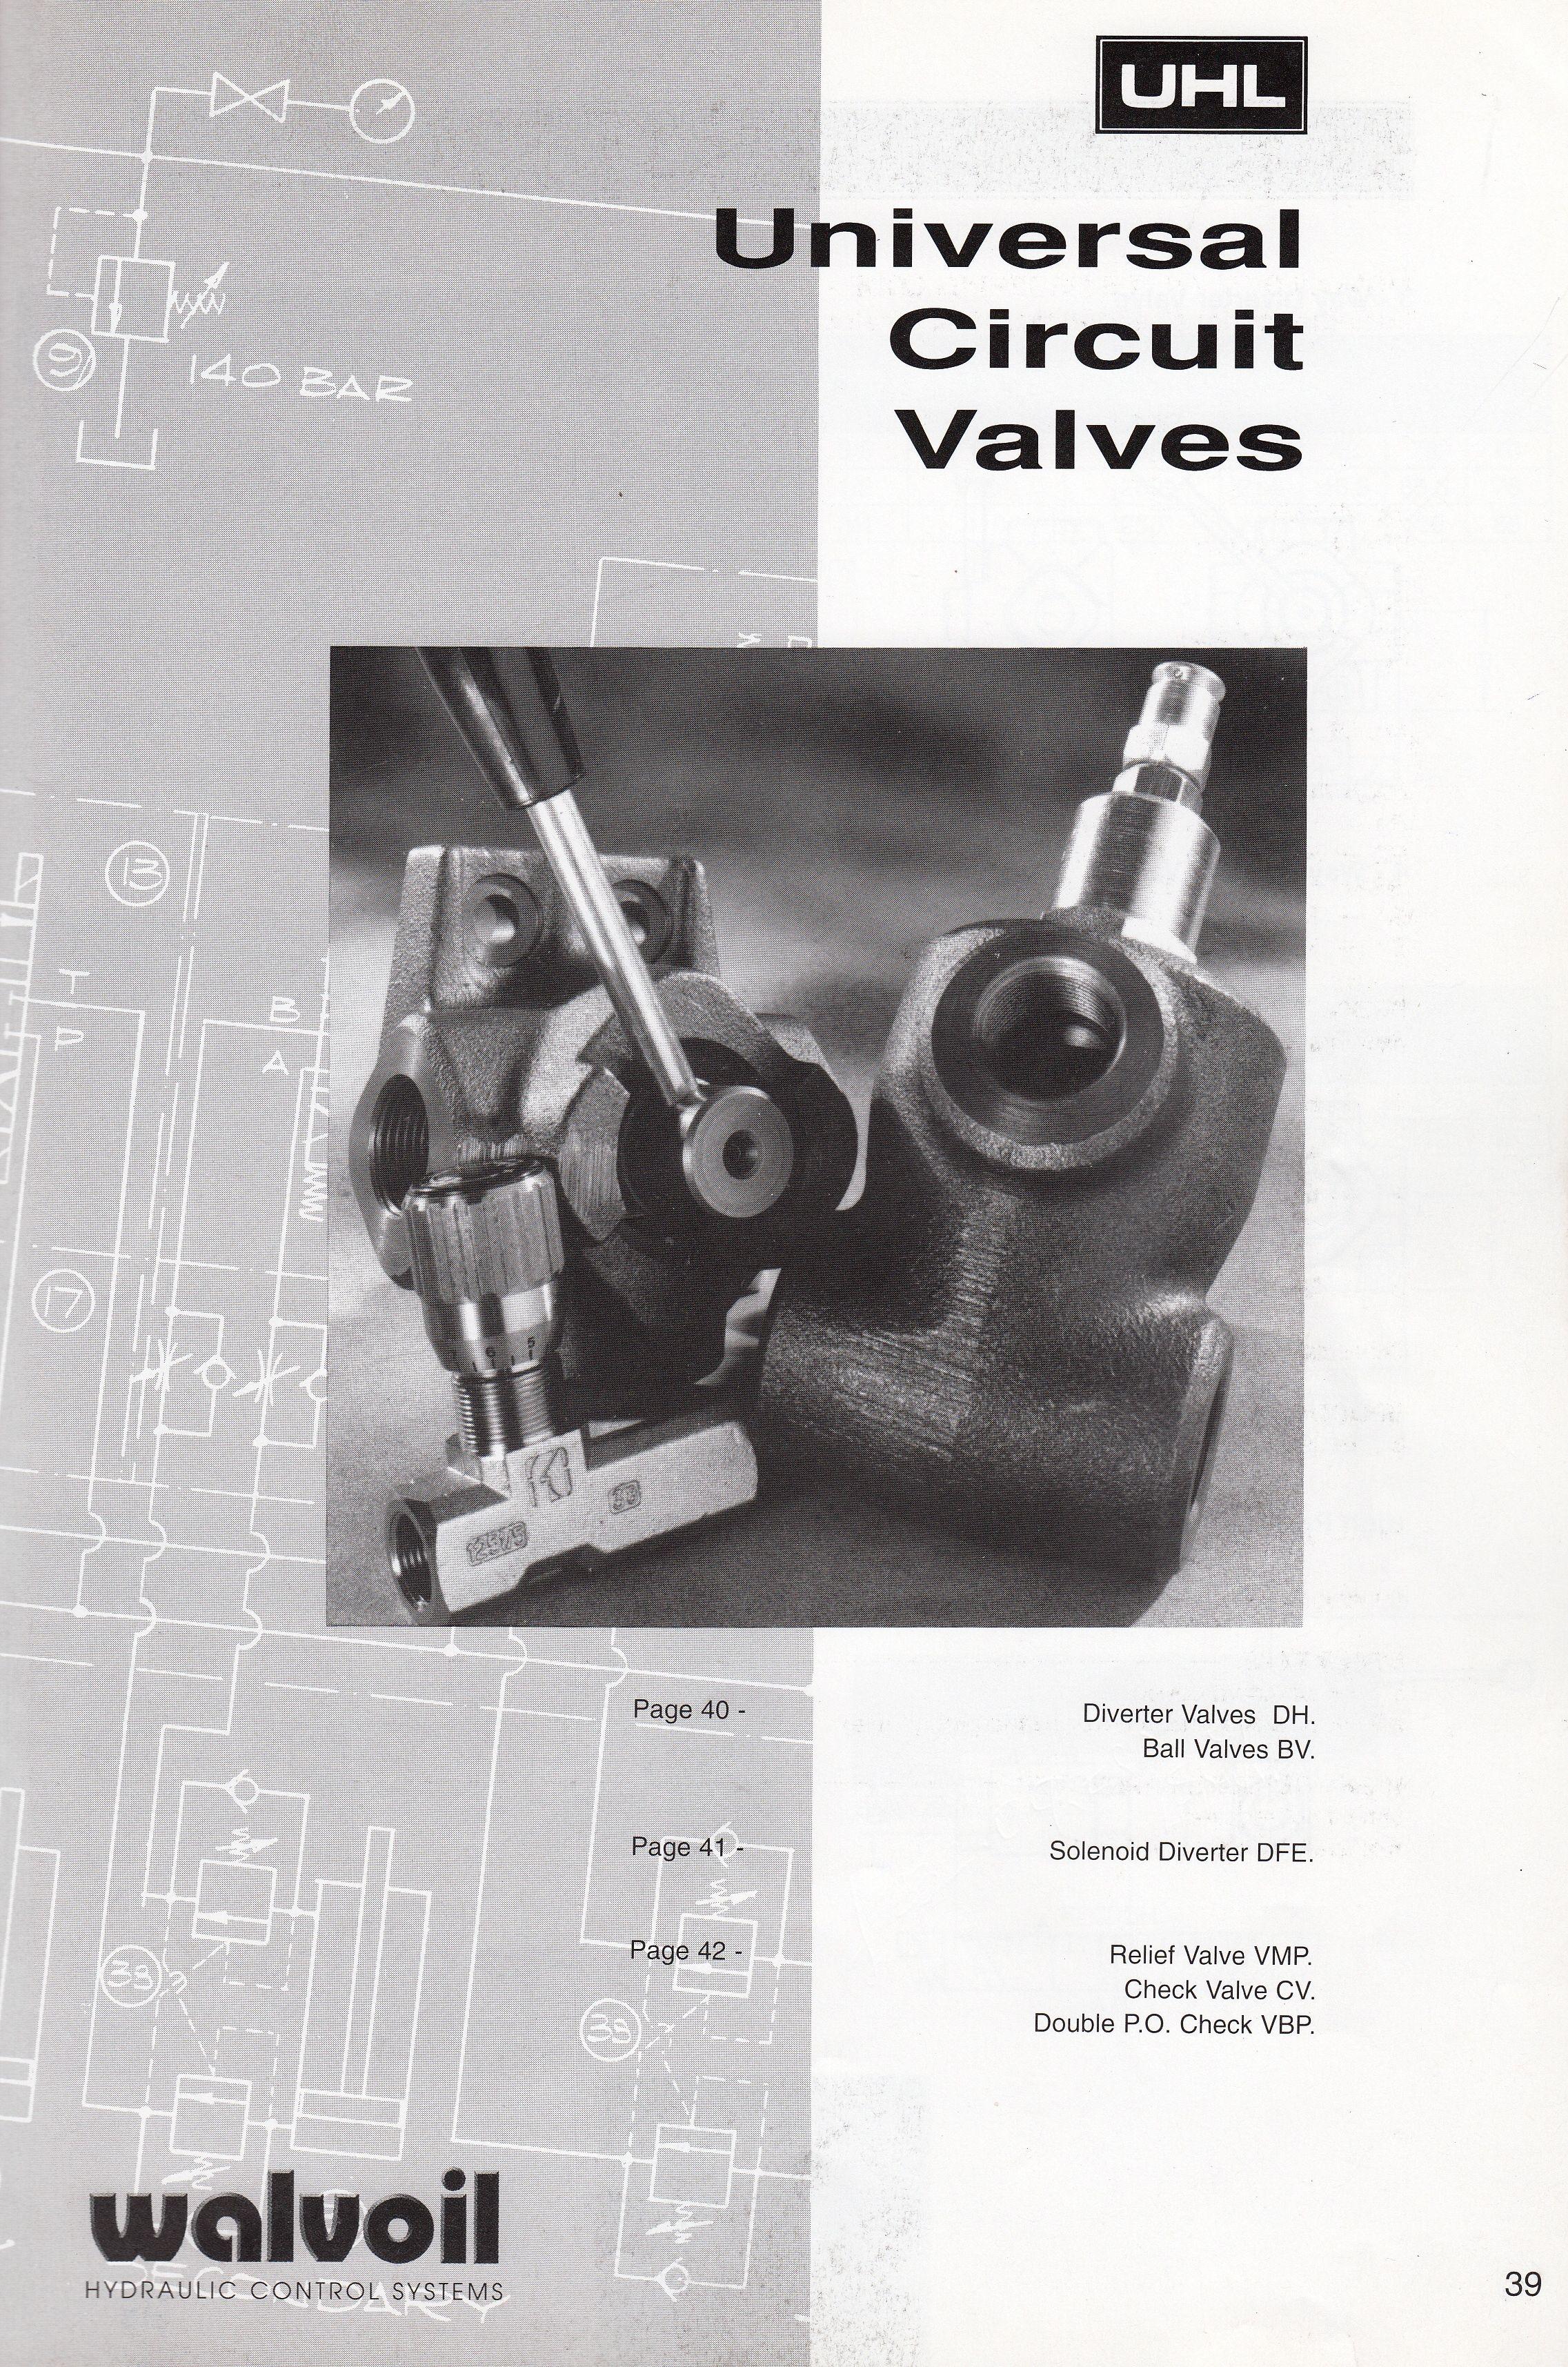 Hydraulic Circuit Valves Manual Diverter Valves Ball Valves Solenoid Diverter Dfe Valves Relief Valves Vmp Check Valves Relief Valve Valve Control Valves